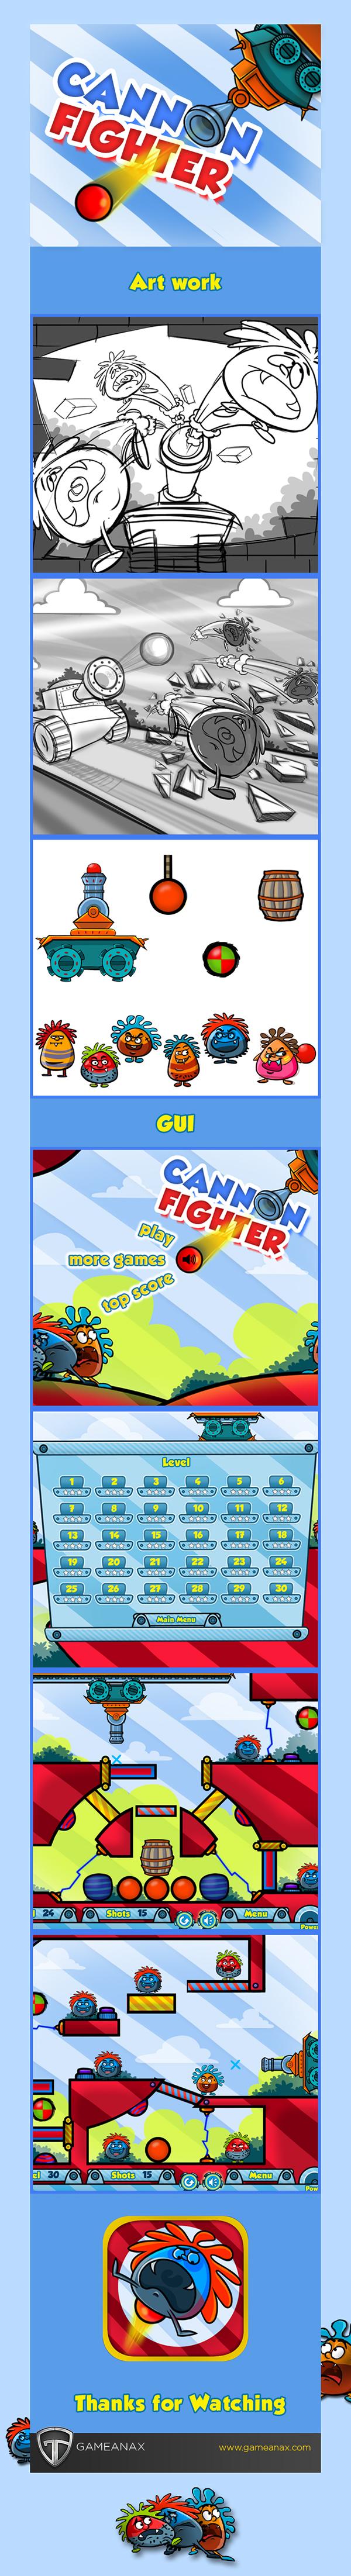 user interface Gaming mobile gaming iphone iPad